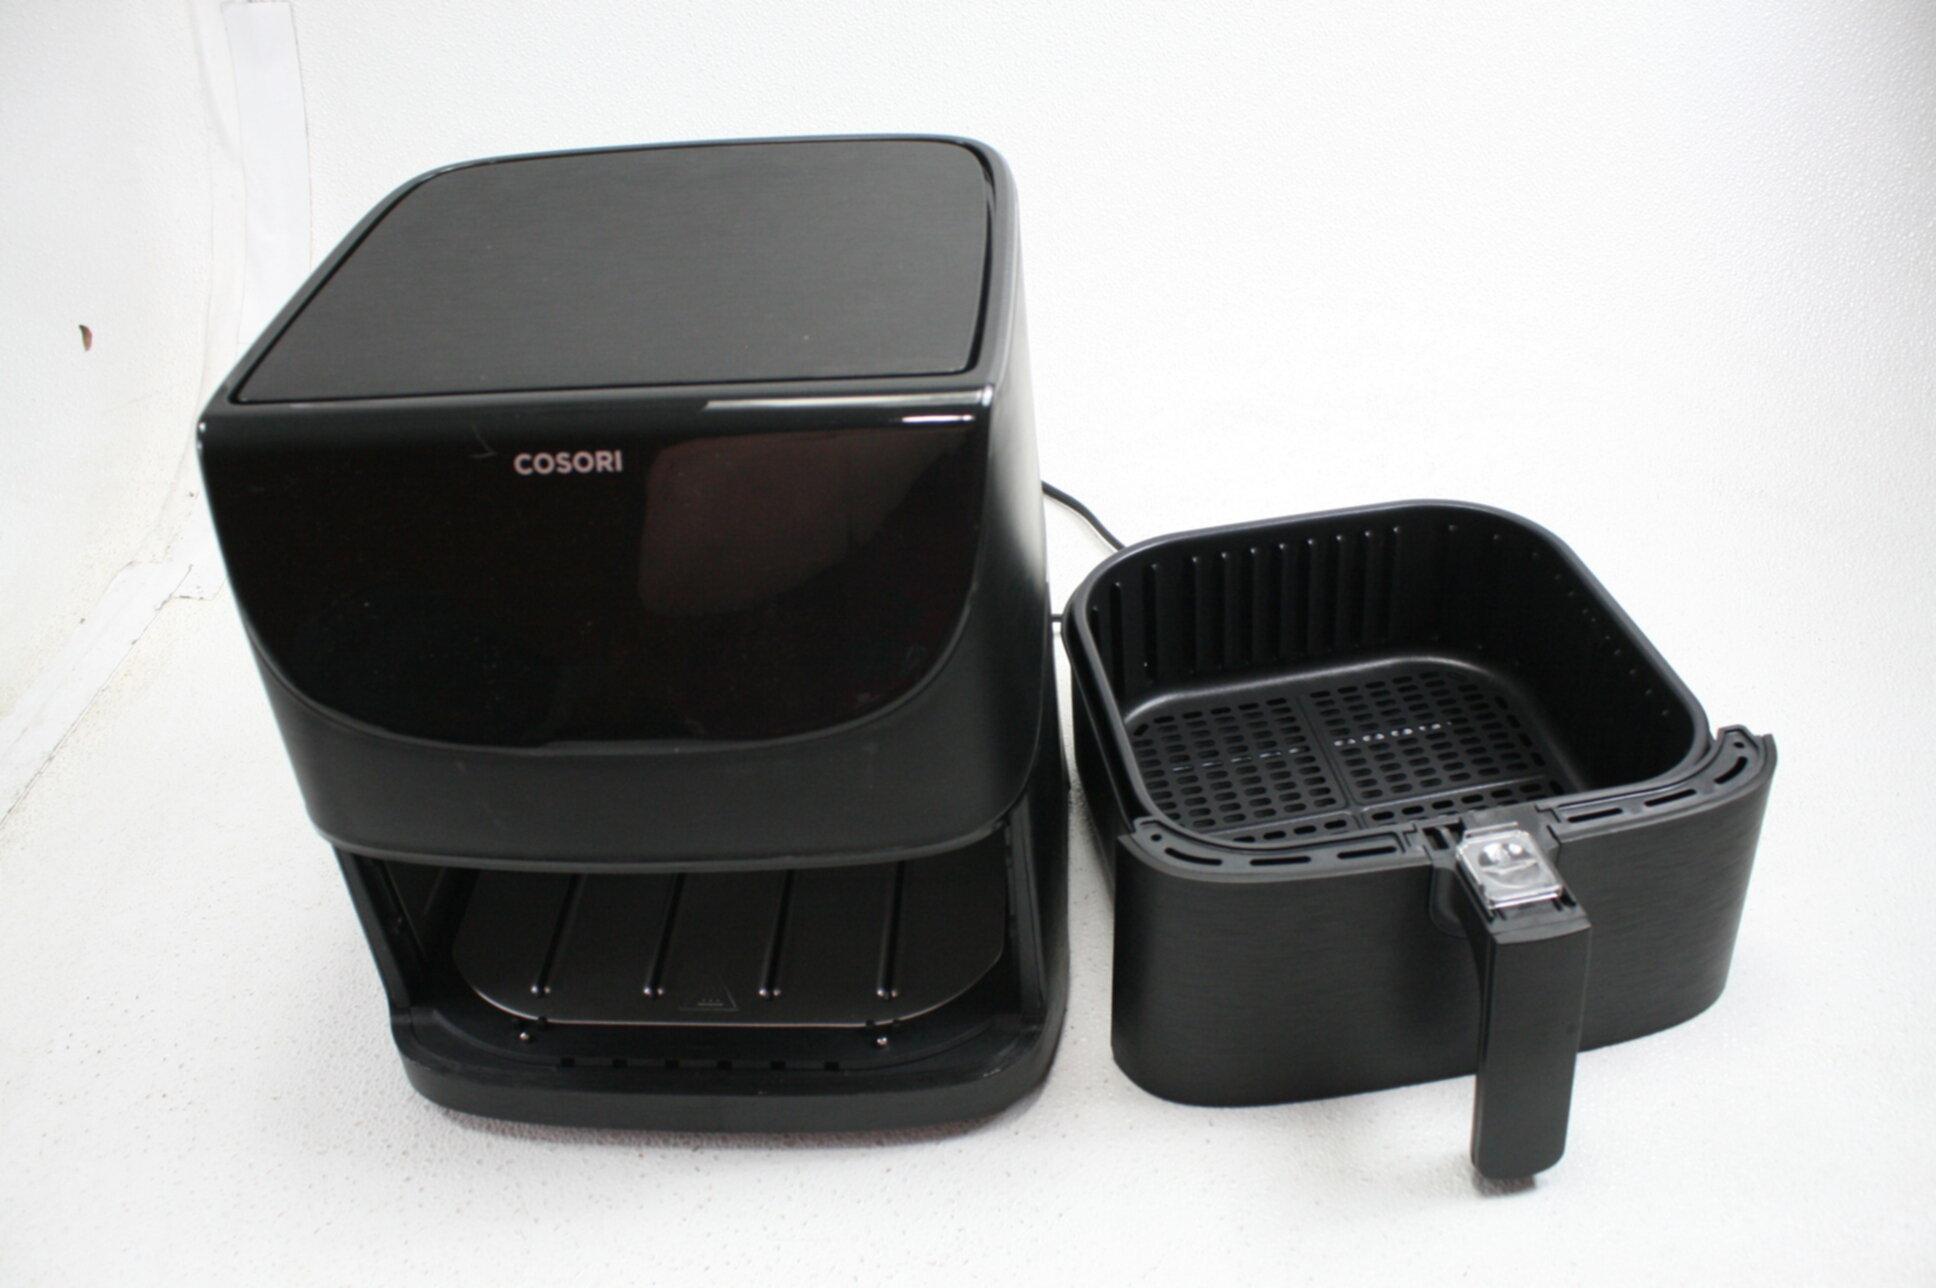 COSORI Smart WiFi 1700 W 5.8 Qt Air Fryer Programmable ...